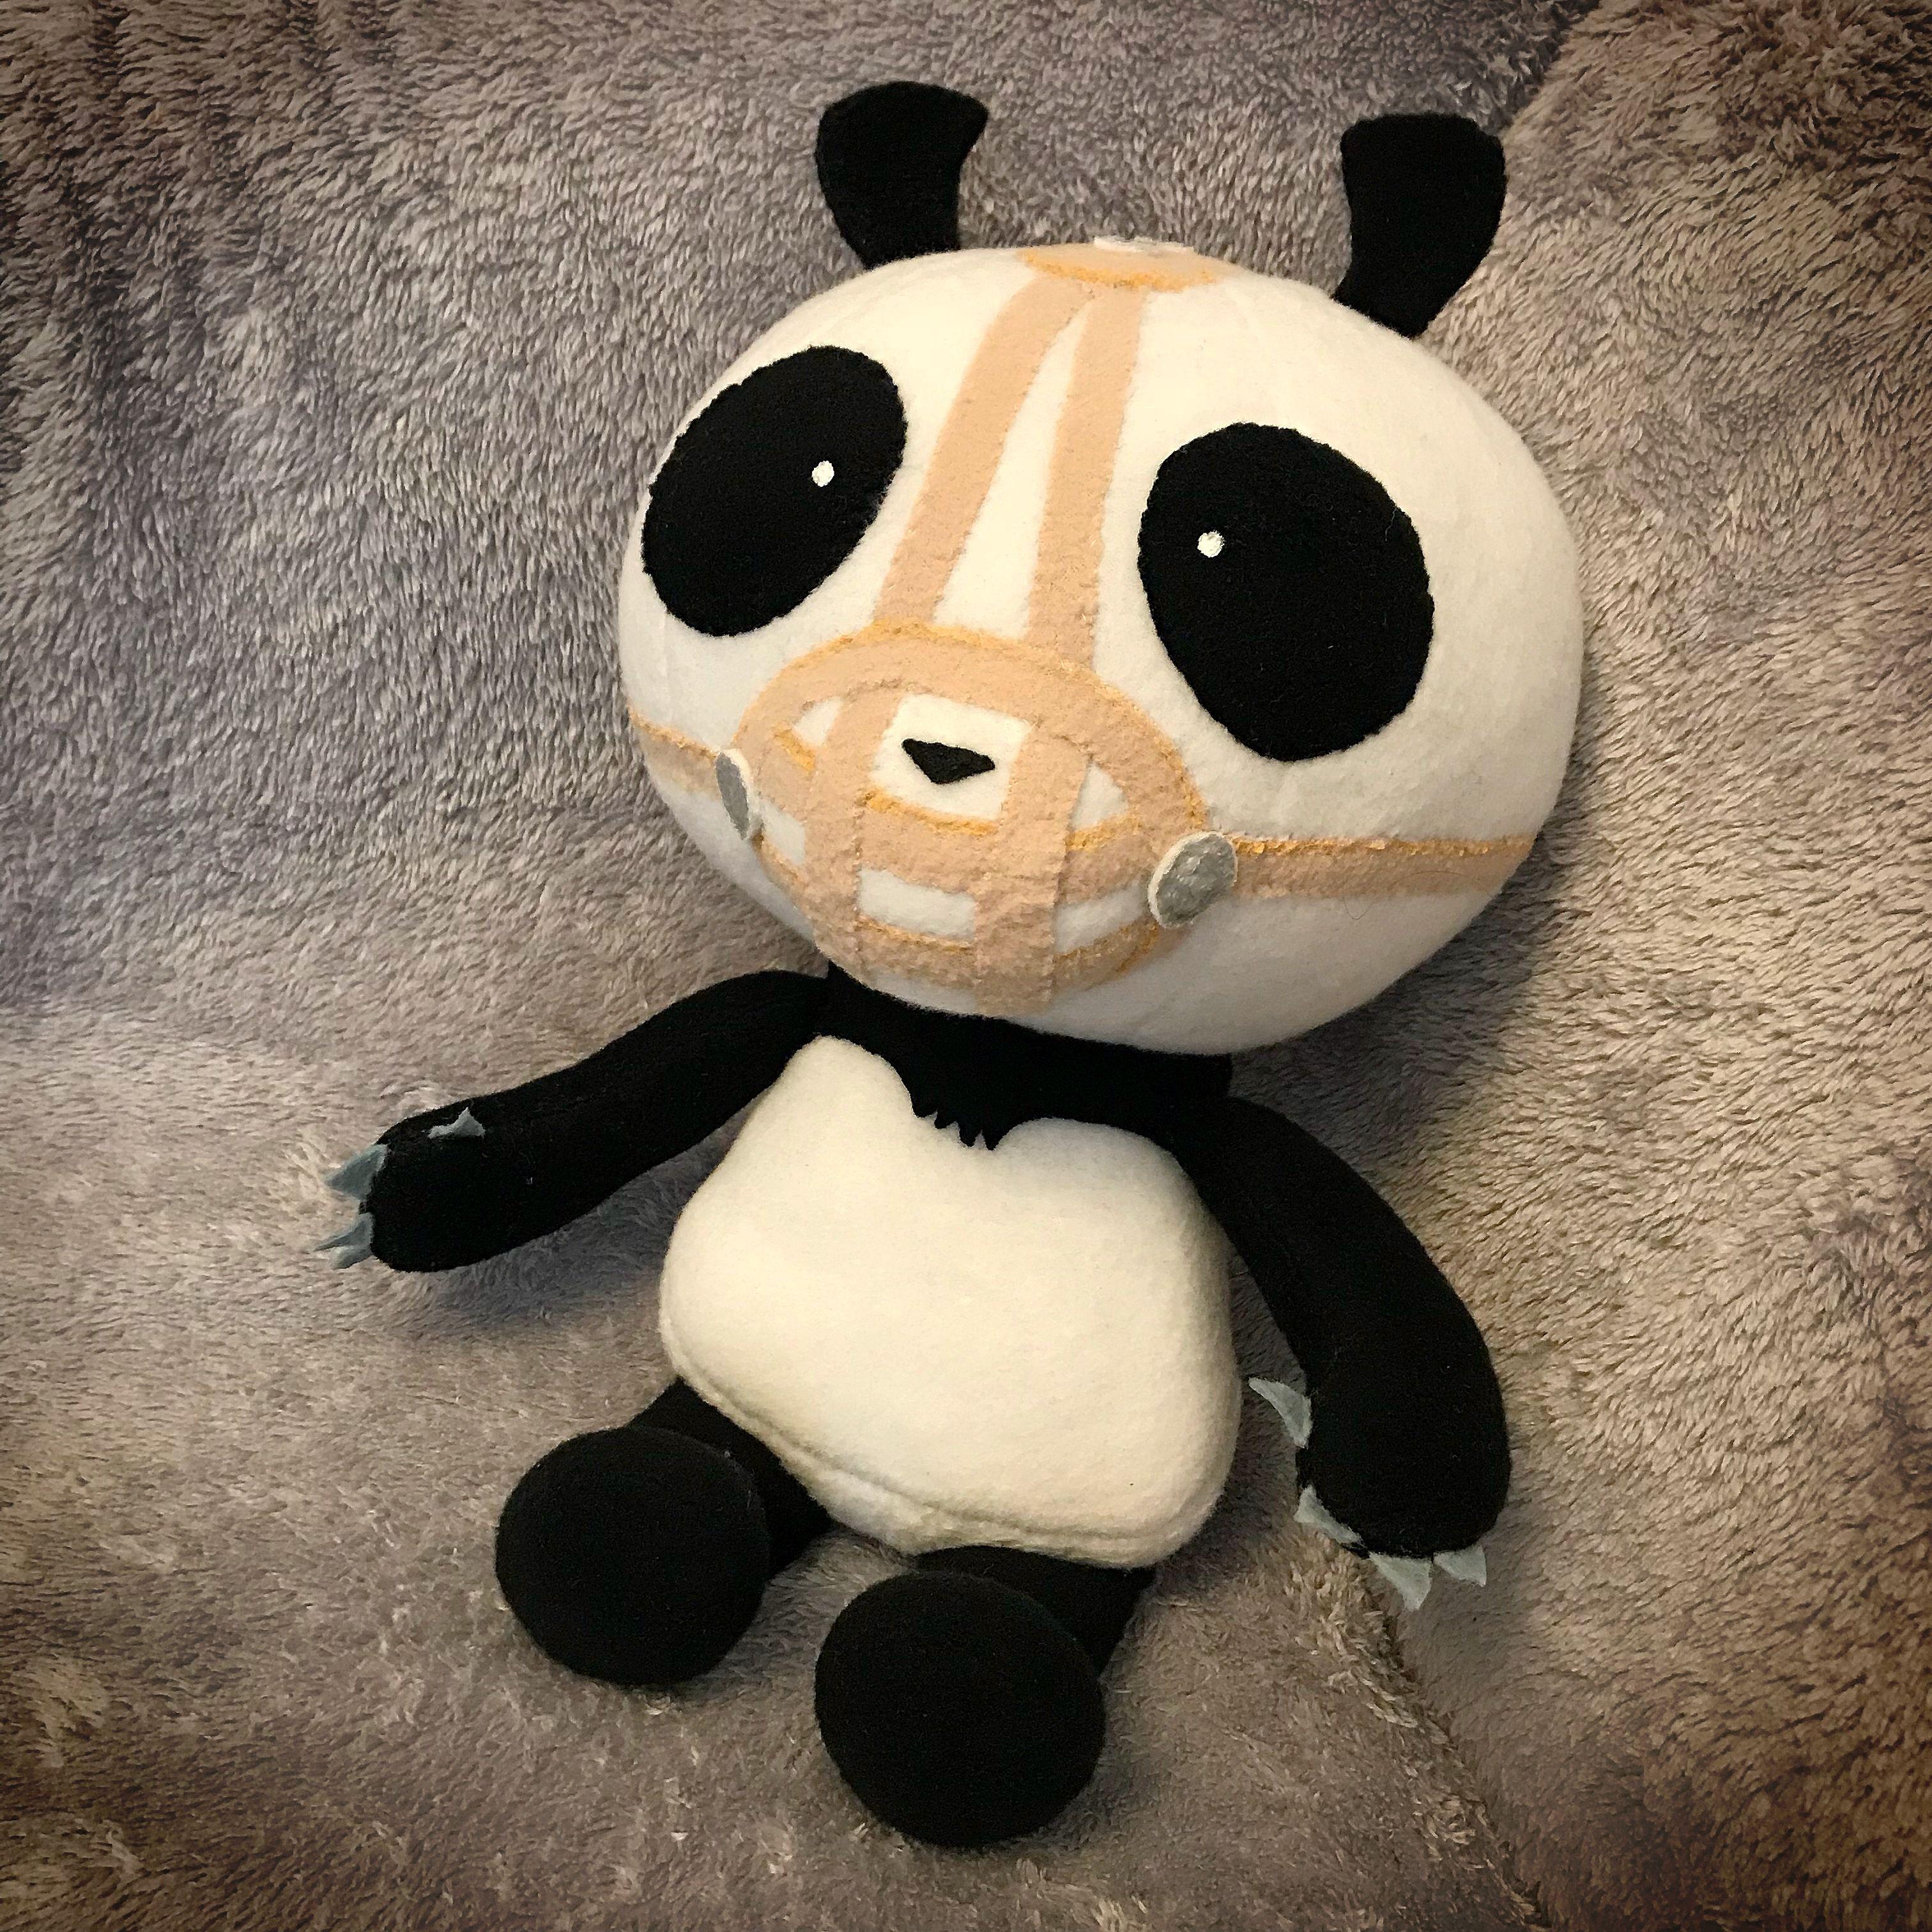 Panda 8 plush from Suckers cartoon Olaf the snowman